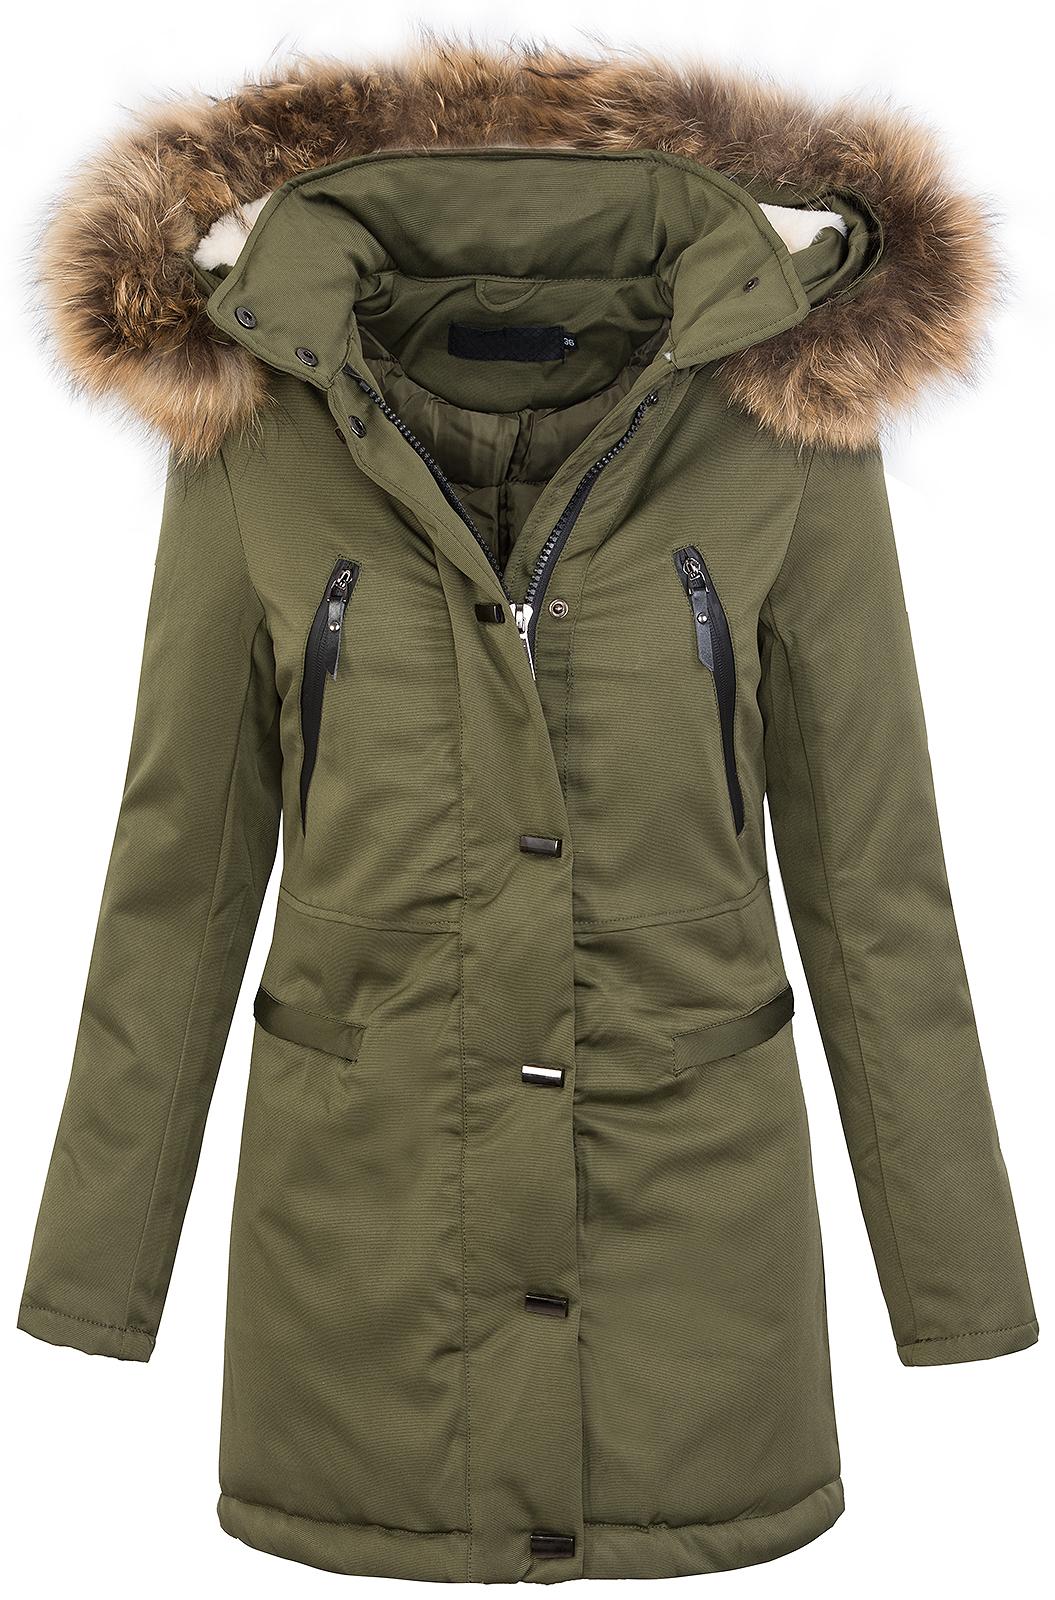 warme damen winter jacke parka lang mantel winterjacke fell kragen kapuze d 213 ebay. Black Bedroom Furniture Sets. Home Design Ideas